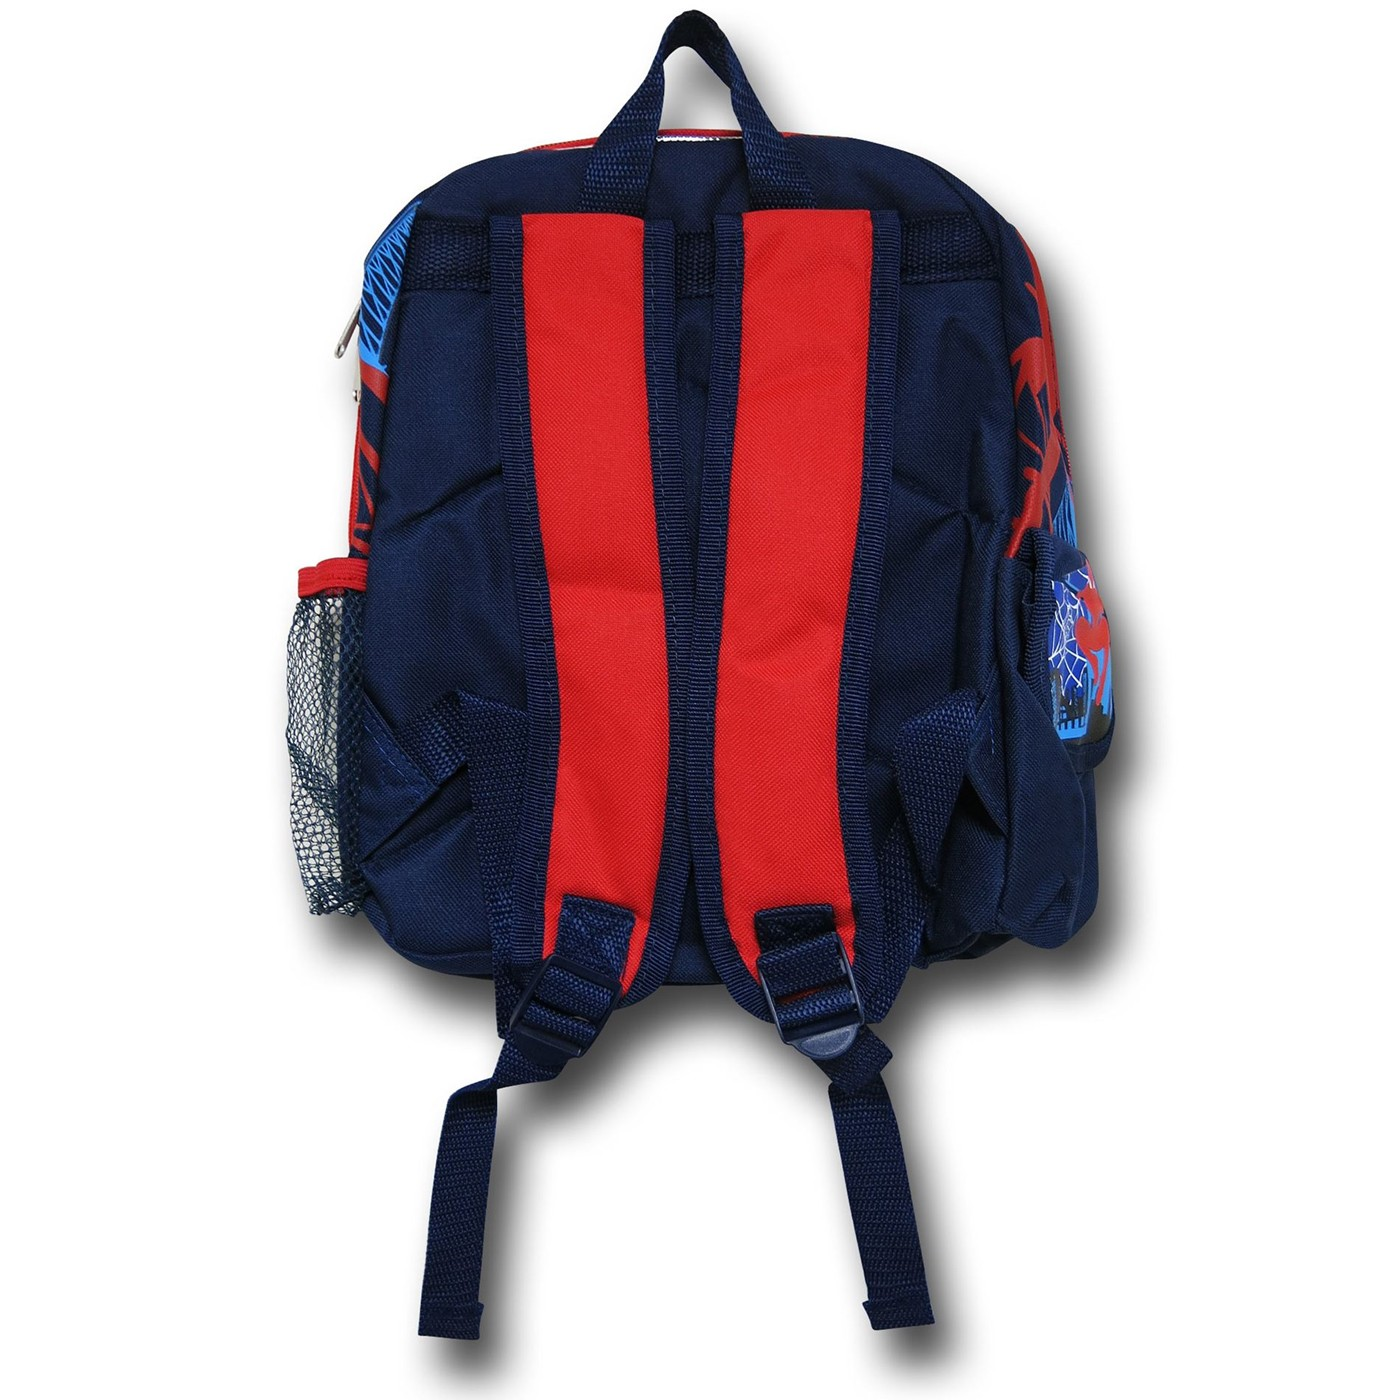 Spiderman Crouching Kids Backpack